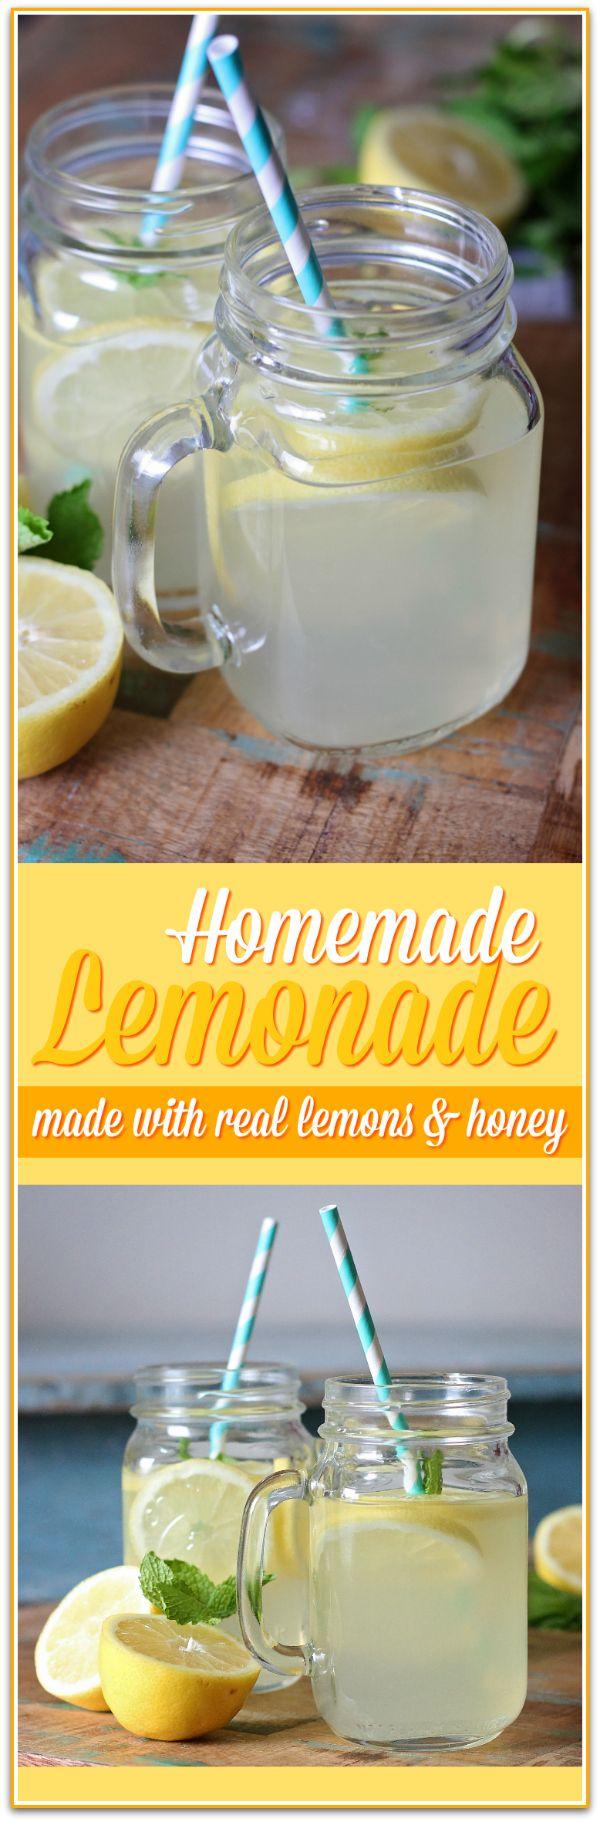 This is the best homemade lemonade recipe using real lemons and honey - so simple & refreshing!